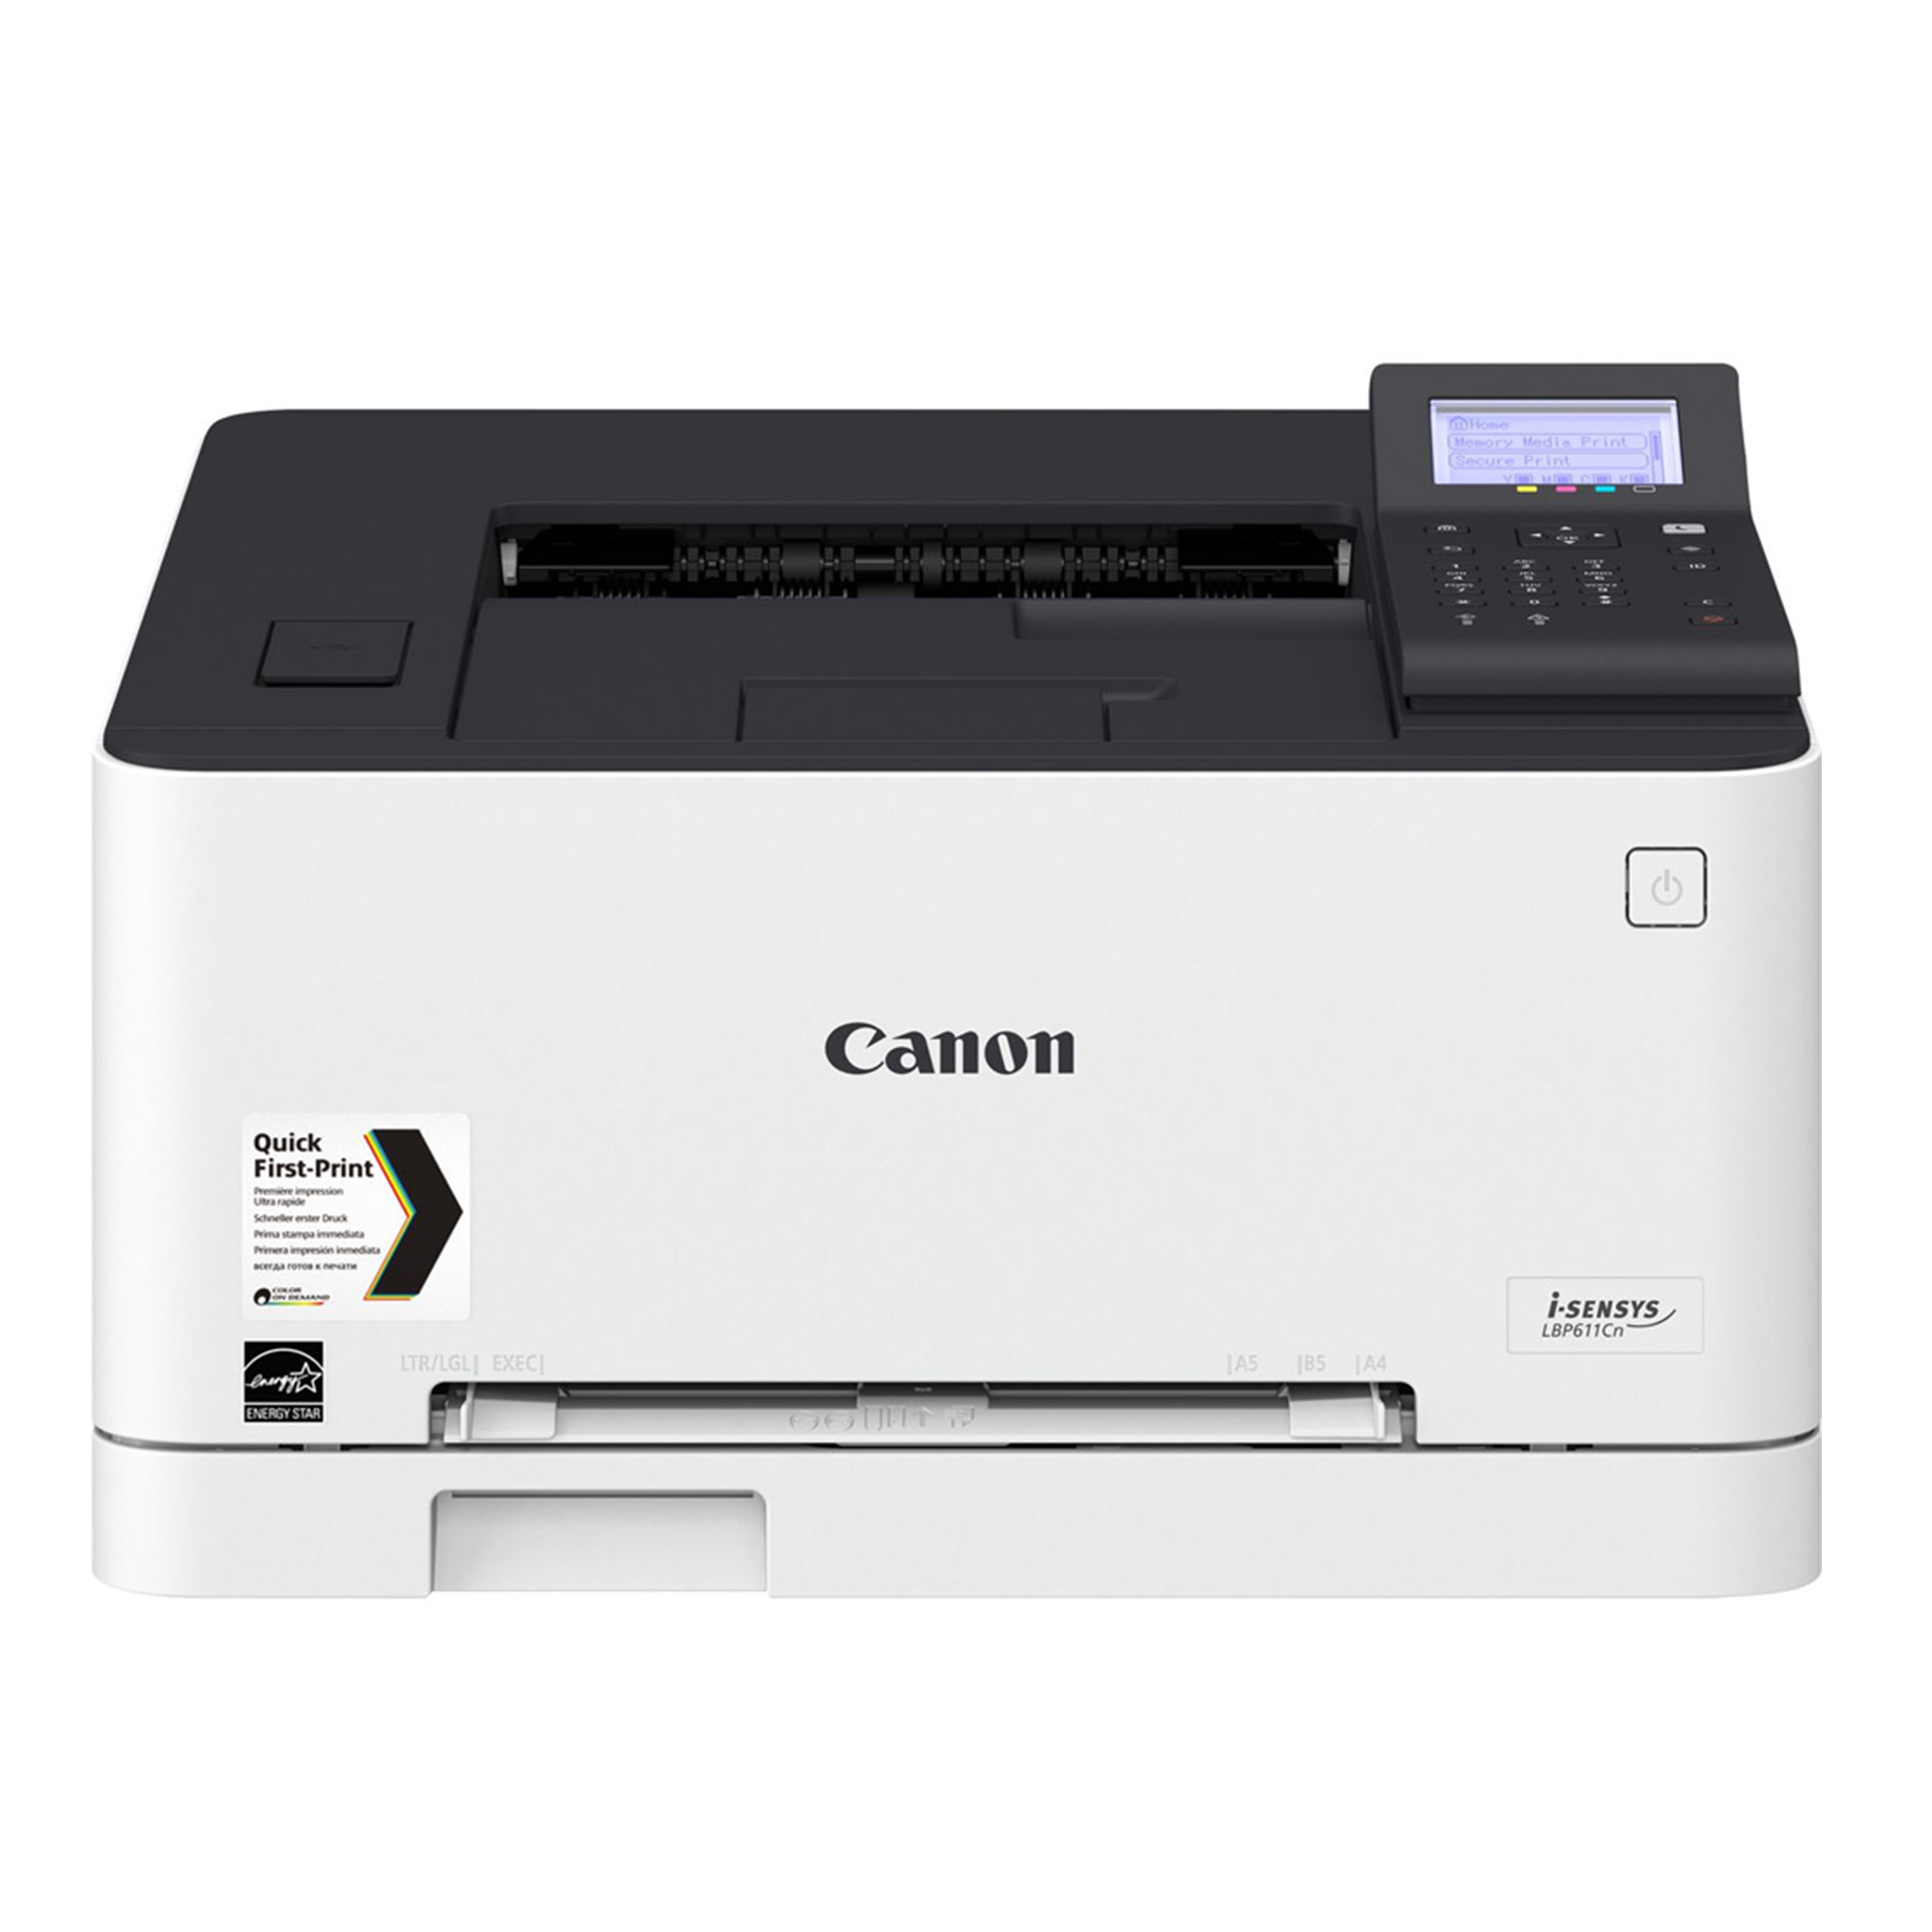 Canon imageCLASS LBP611Cn